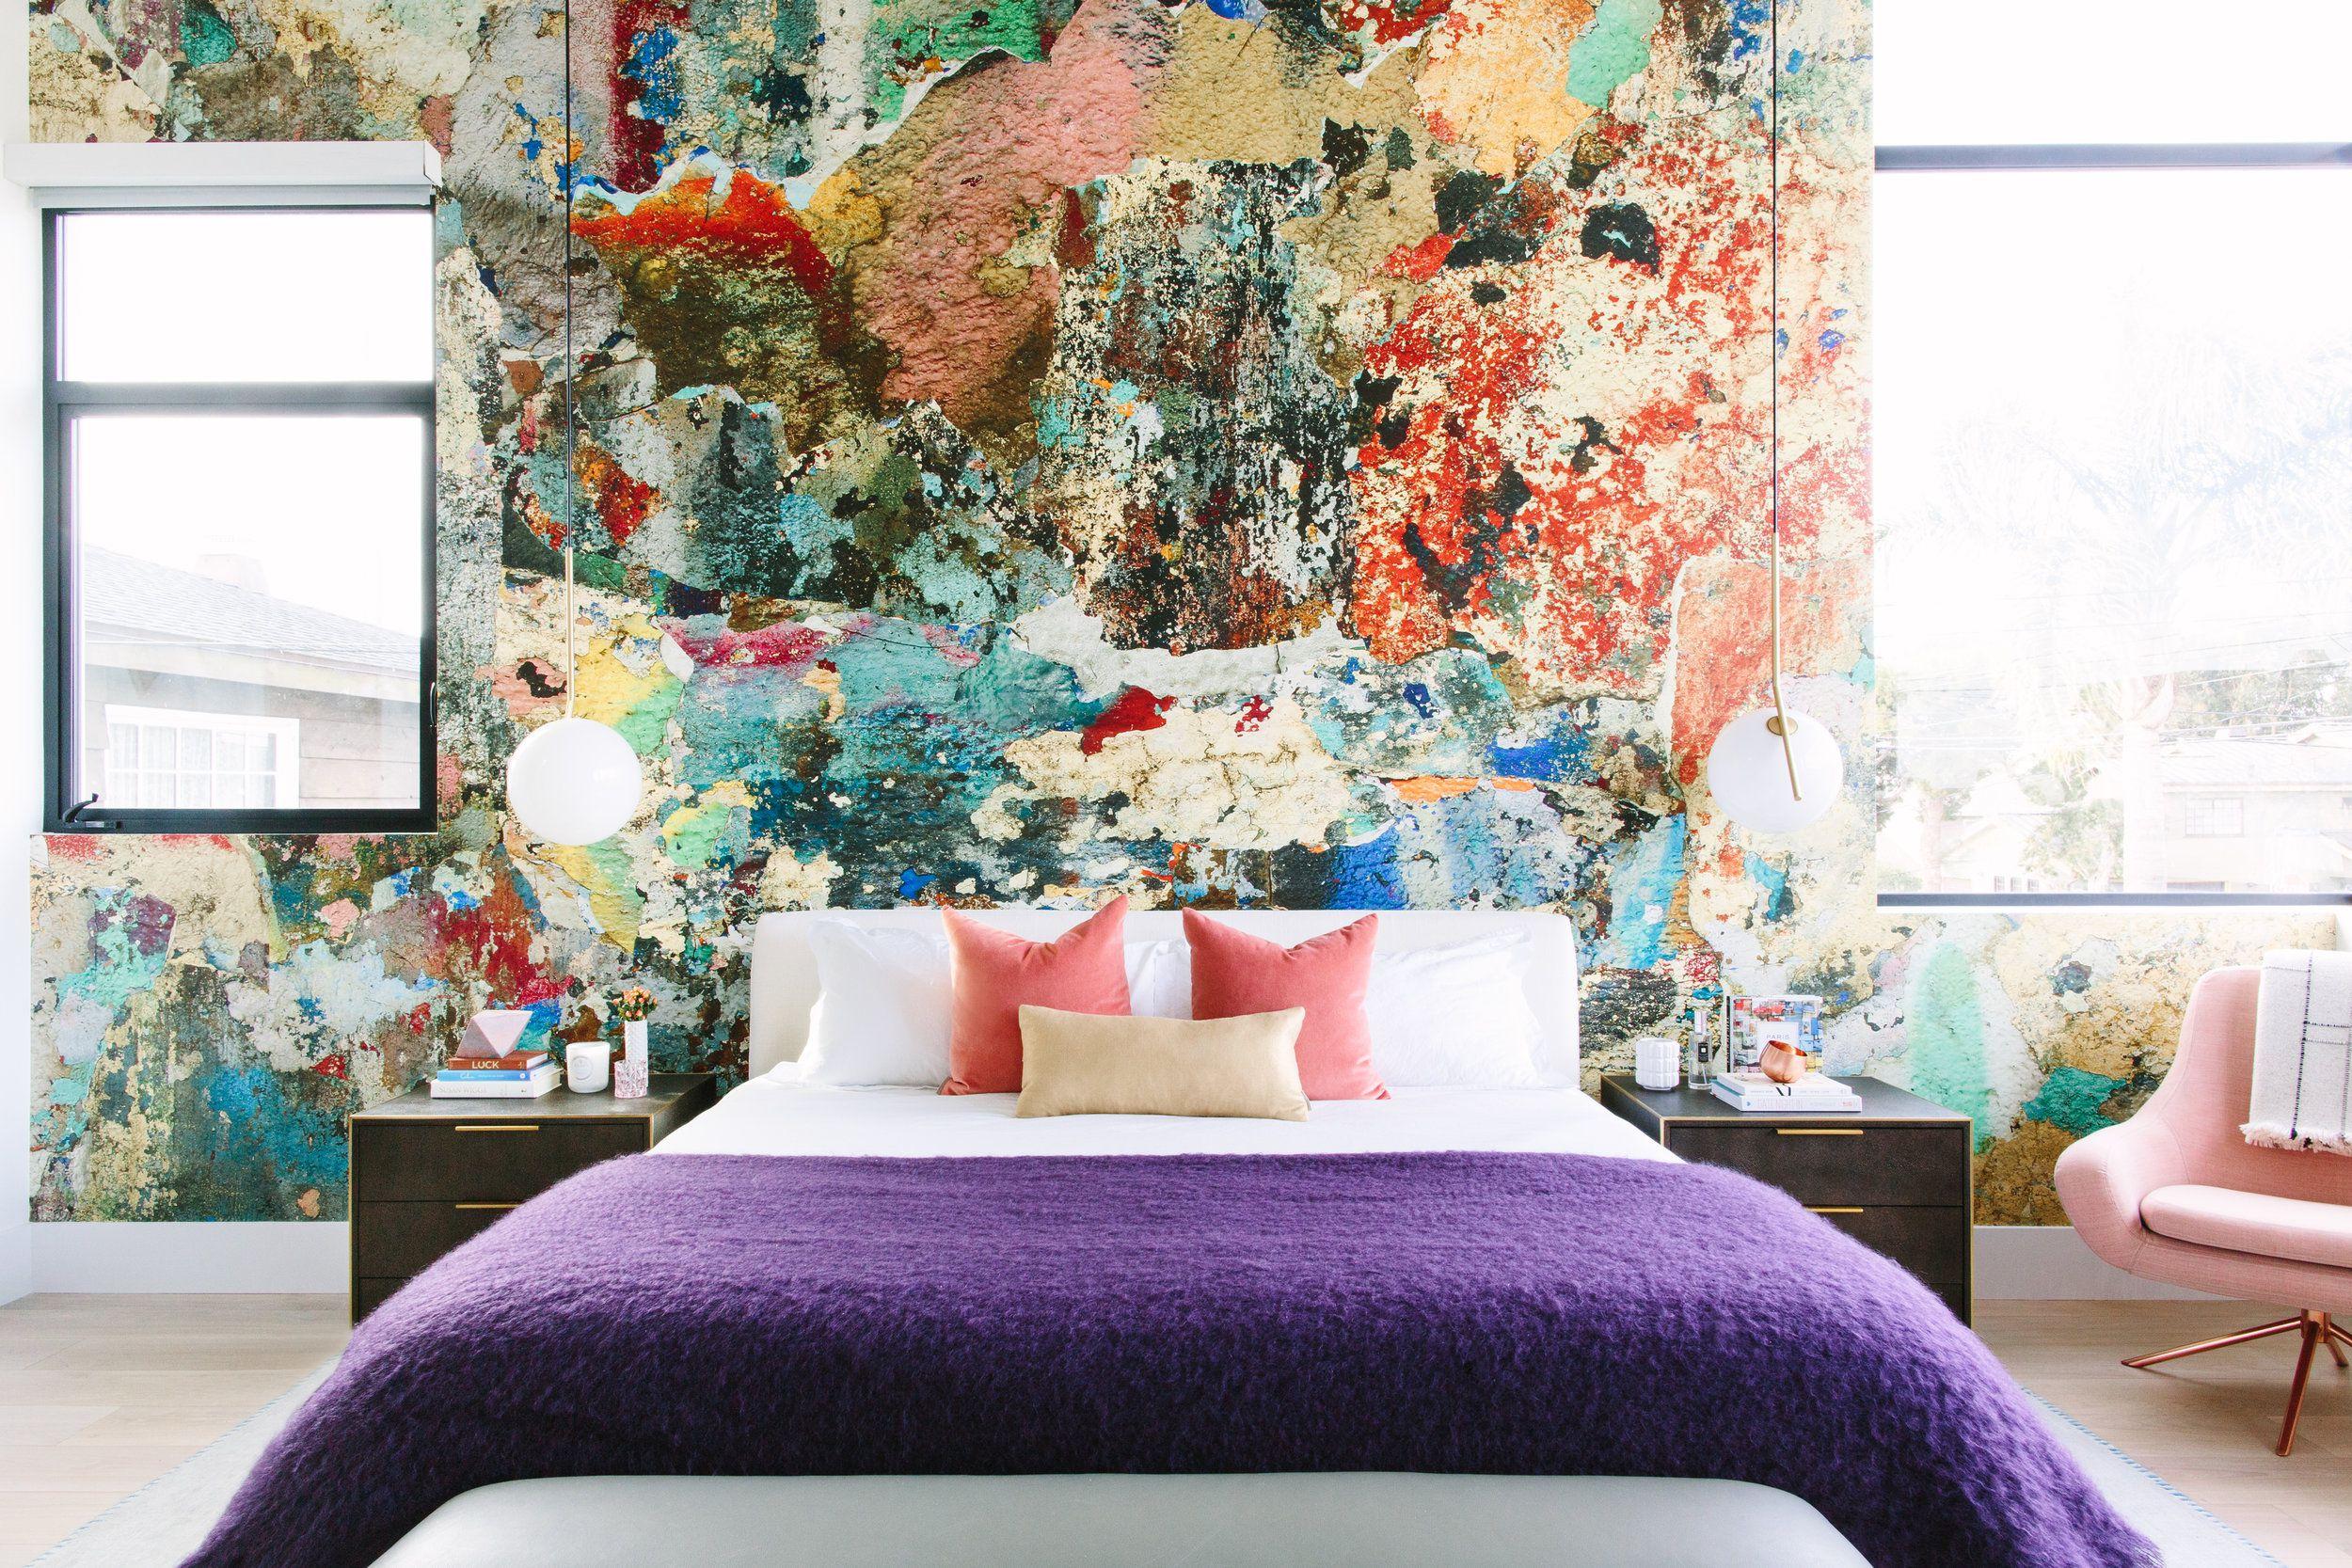 12 Best Bedroom Wall Decor Ideas in 2018 - Bedroom Wall Decor